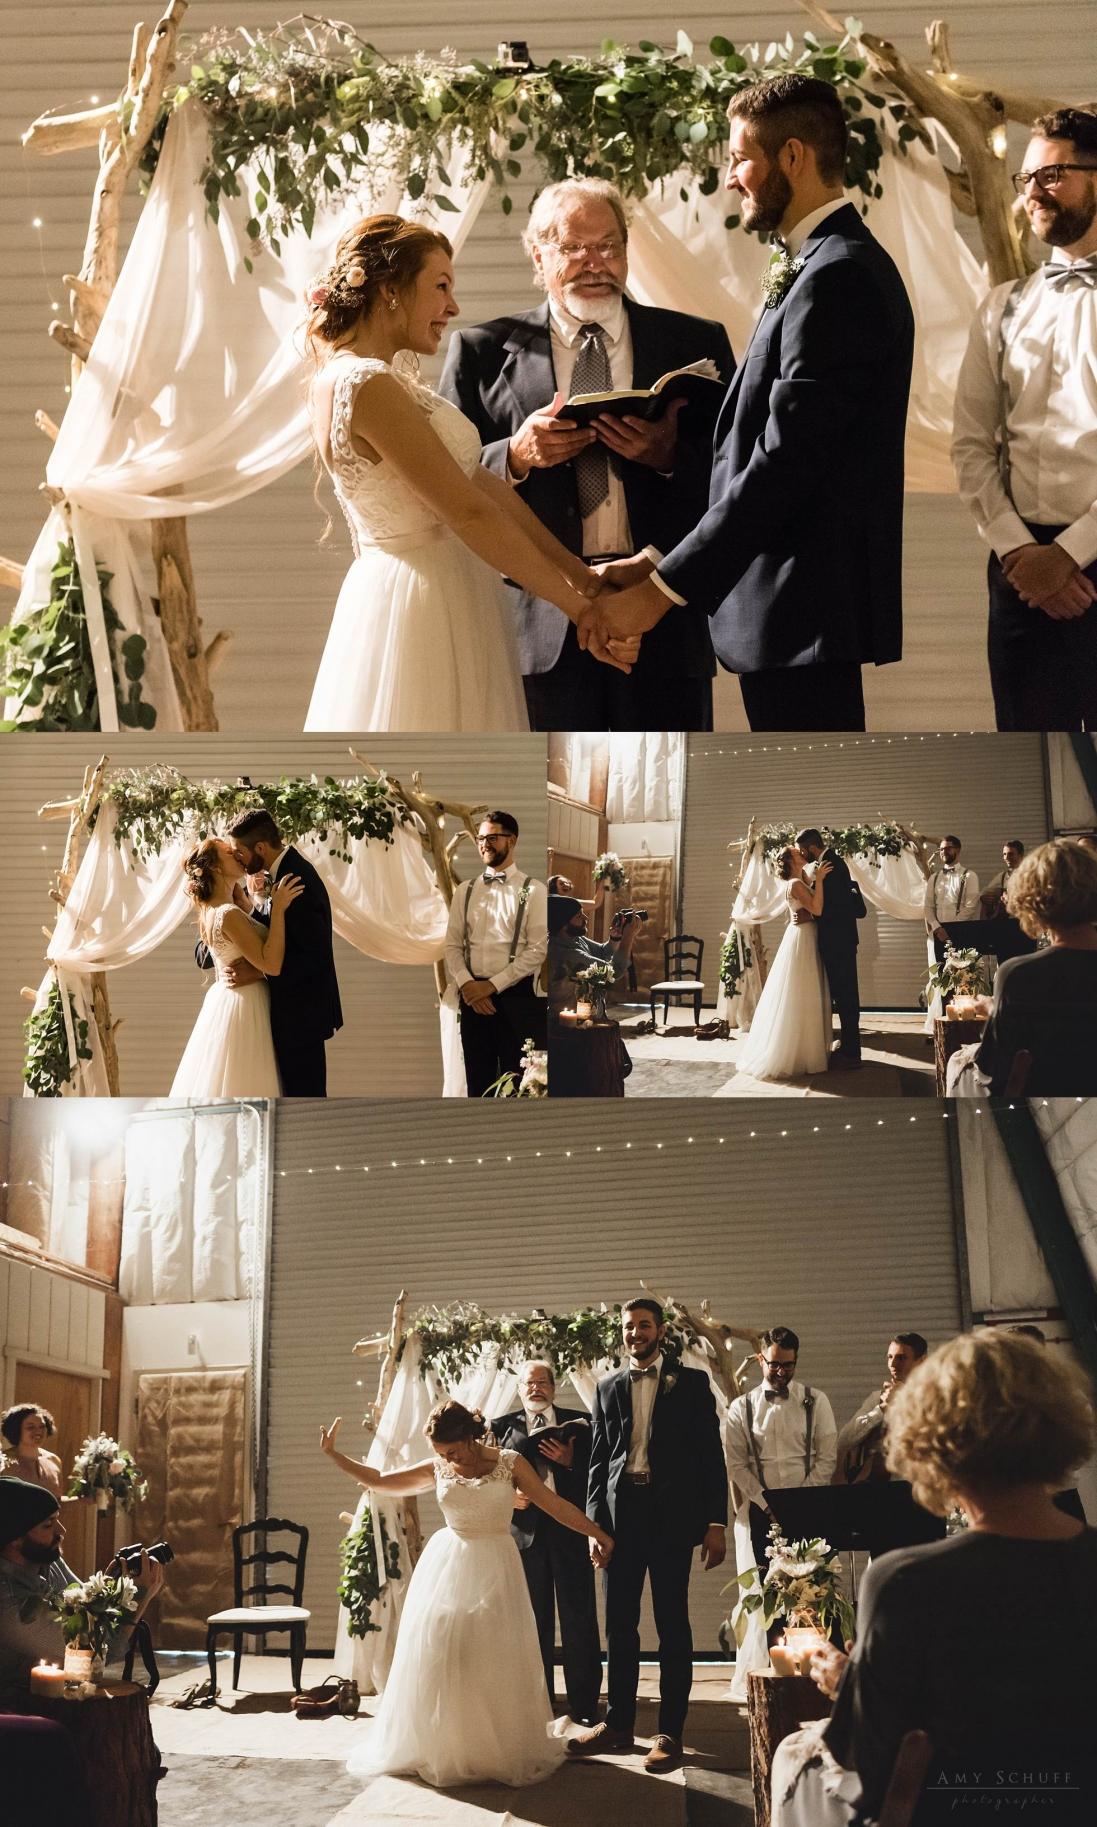 Amy Schuff - Sacramento Wedding Photographer_0071